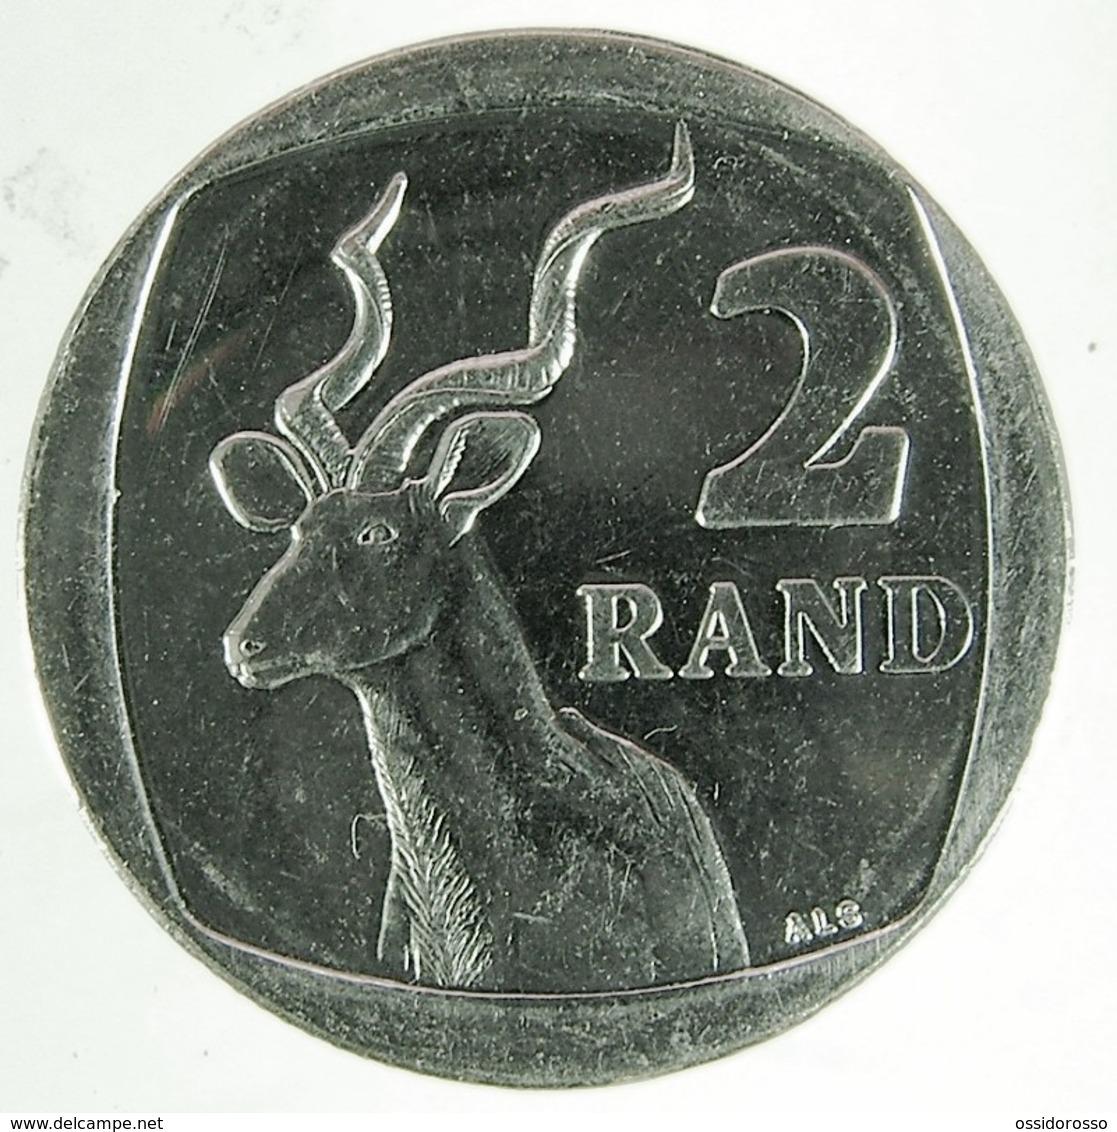 South Africa 2 Rand 2018 - F (fine) - Sud Africa